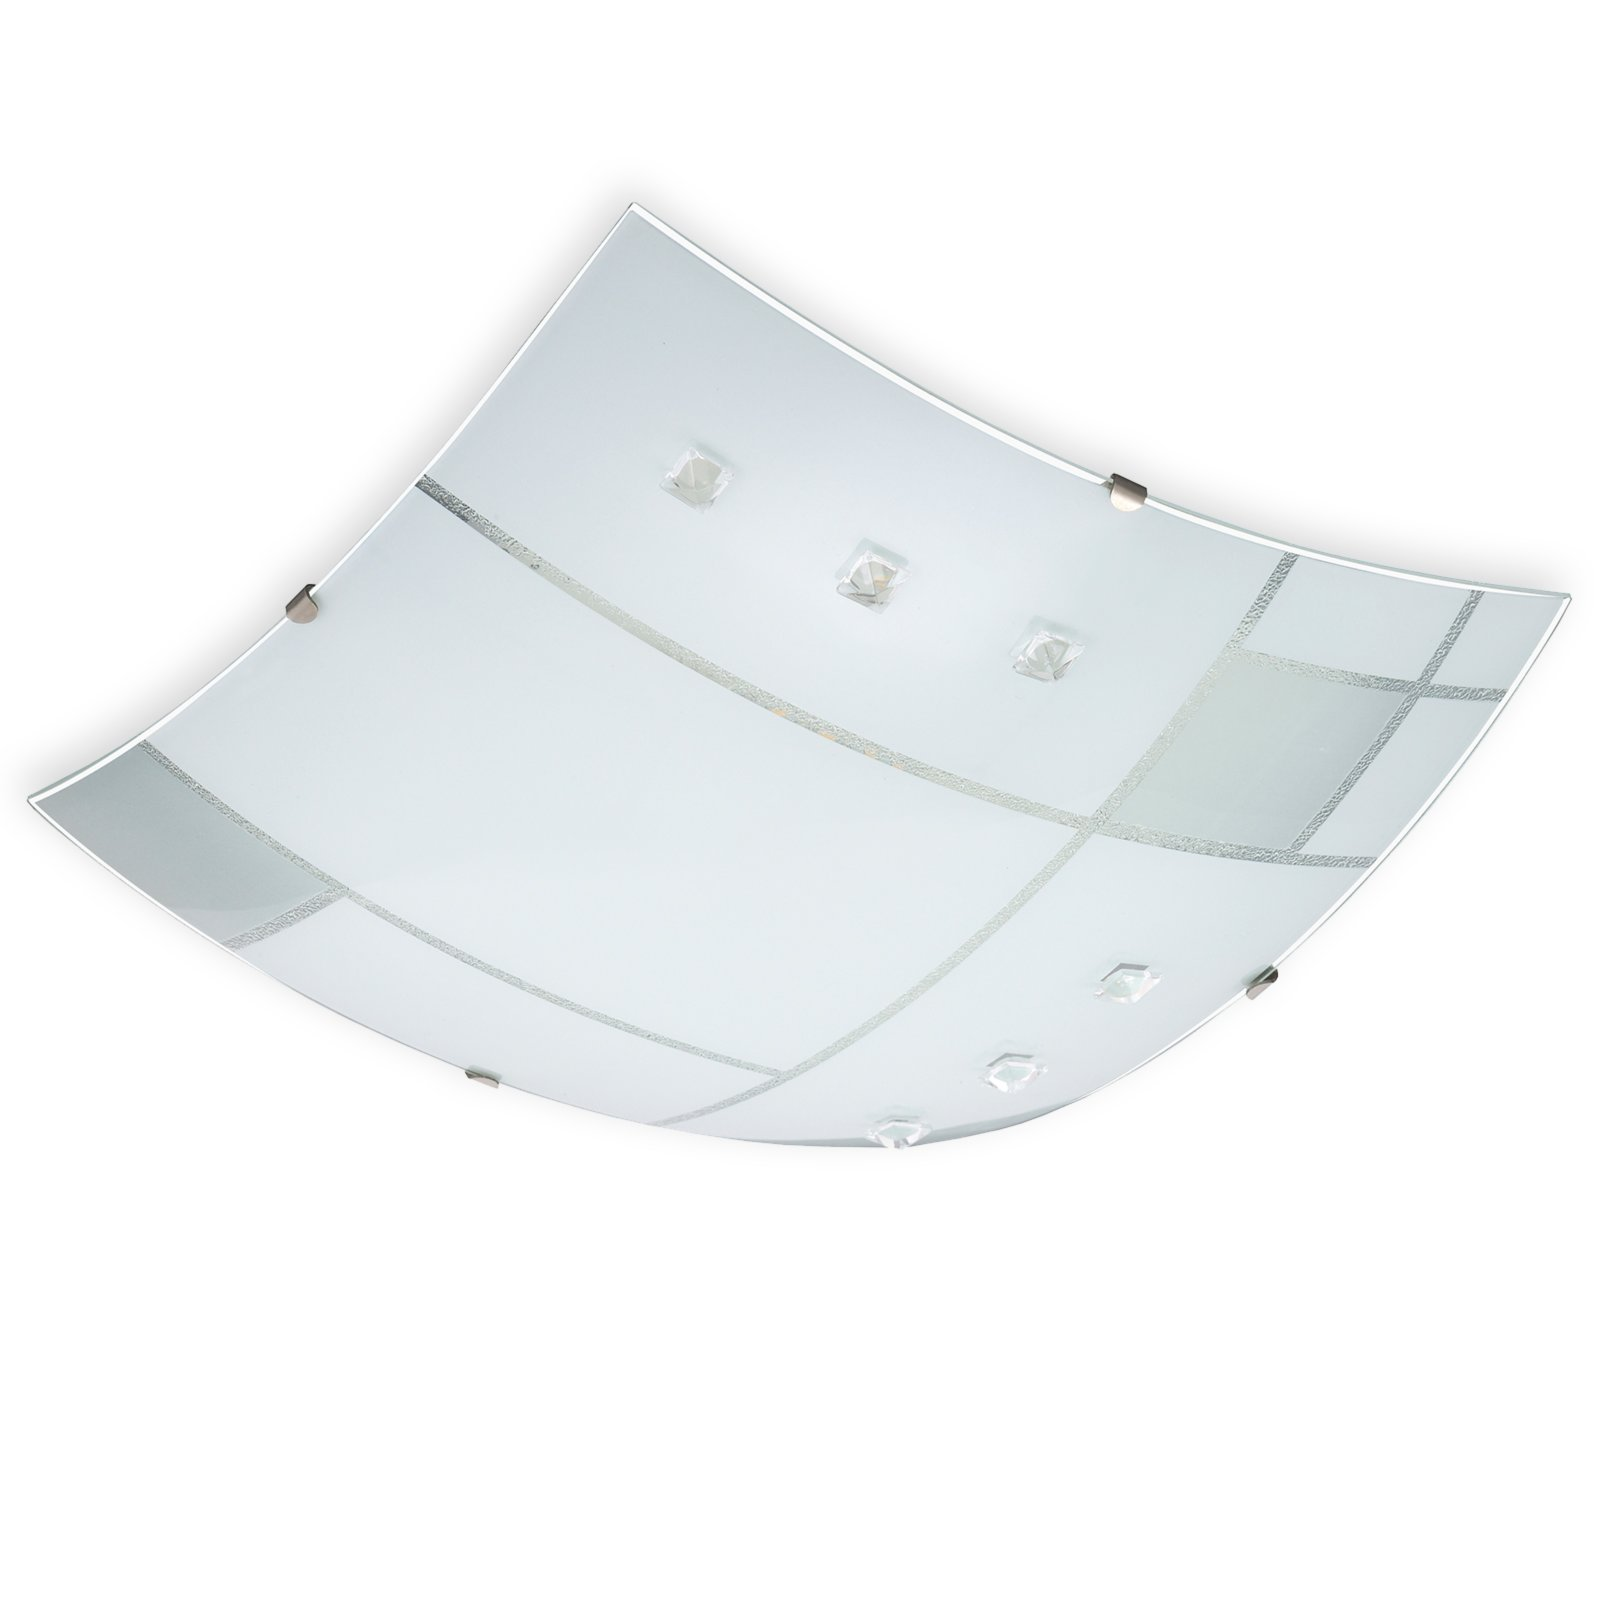 led deckenleuchte carre wei 30x30 cm led leuchten lampen m bel m belhaus roller. Black Bedroom Furniture Sets. Home Design Ideas